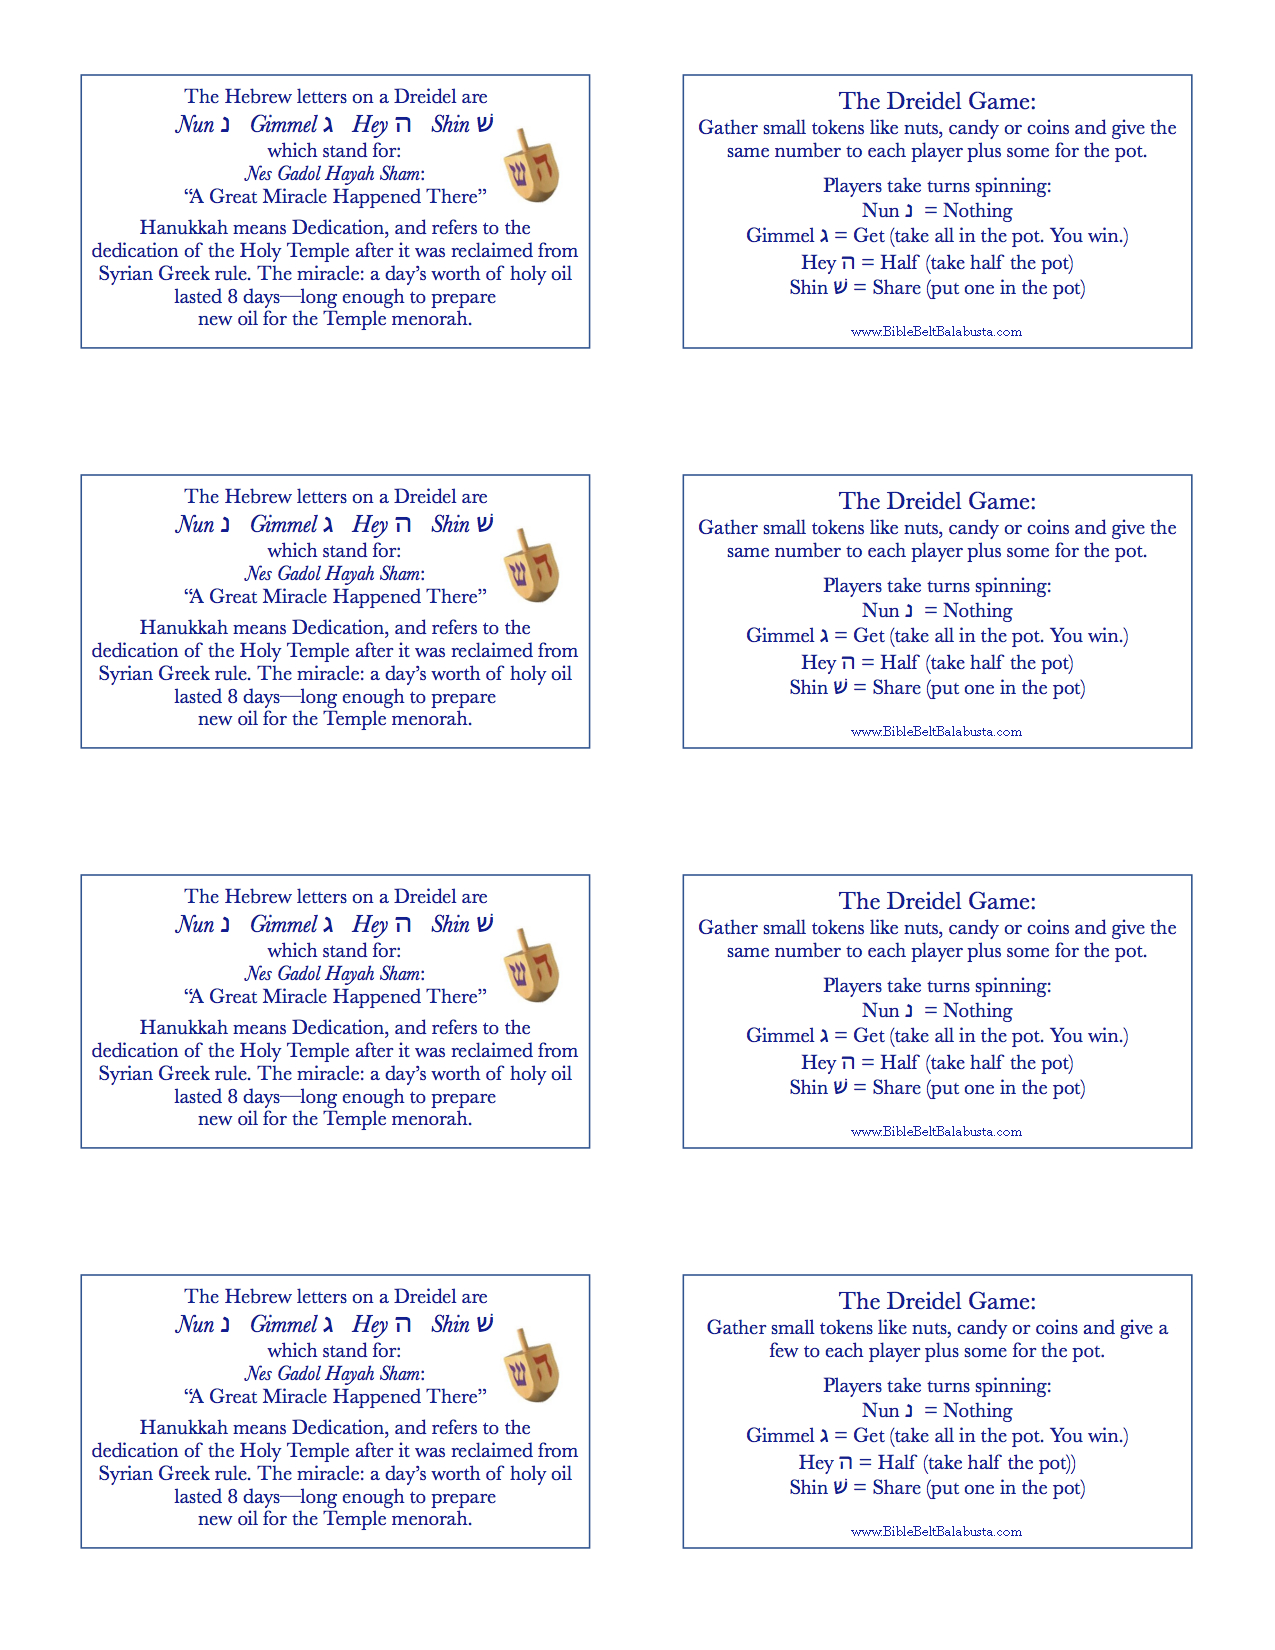 image regarding How to Play Dreidel Printable named Printable Dreidel Guidelines (present tags) Bible Belt Balabusta